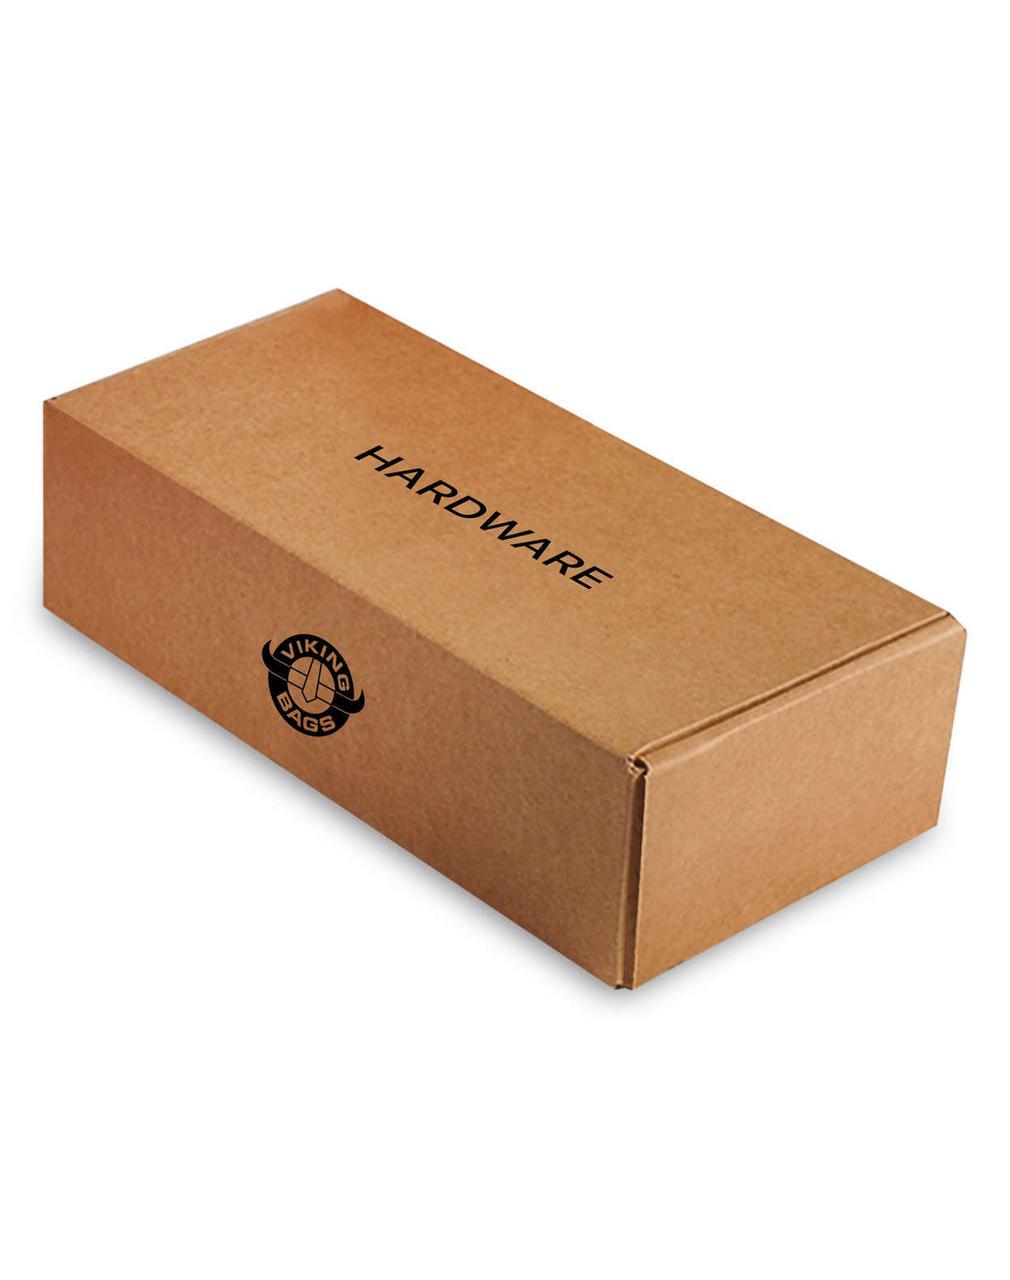 Honda VTX 1300 R Retro Viking Lamellar Leather Covered Shock Cutout Hard Saddlebag Hardware Box